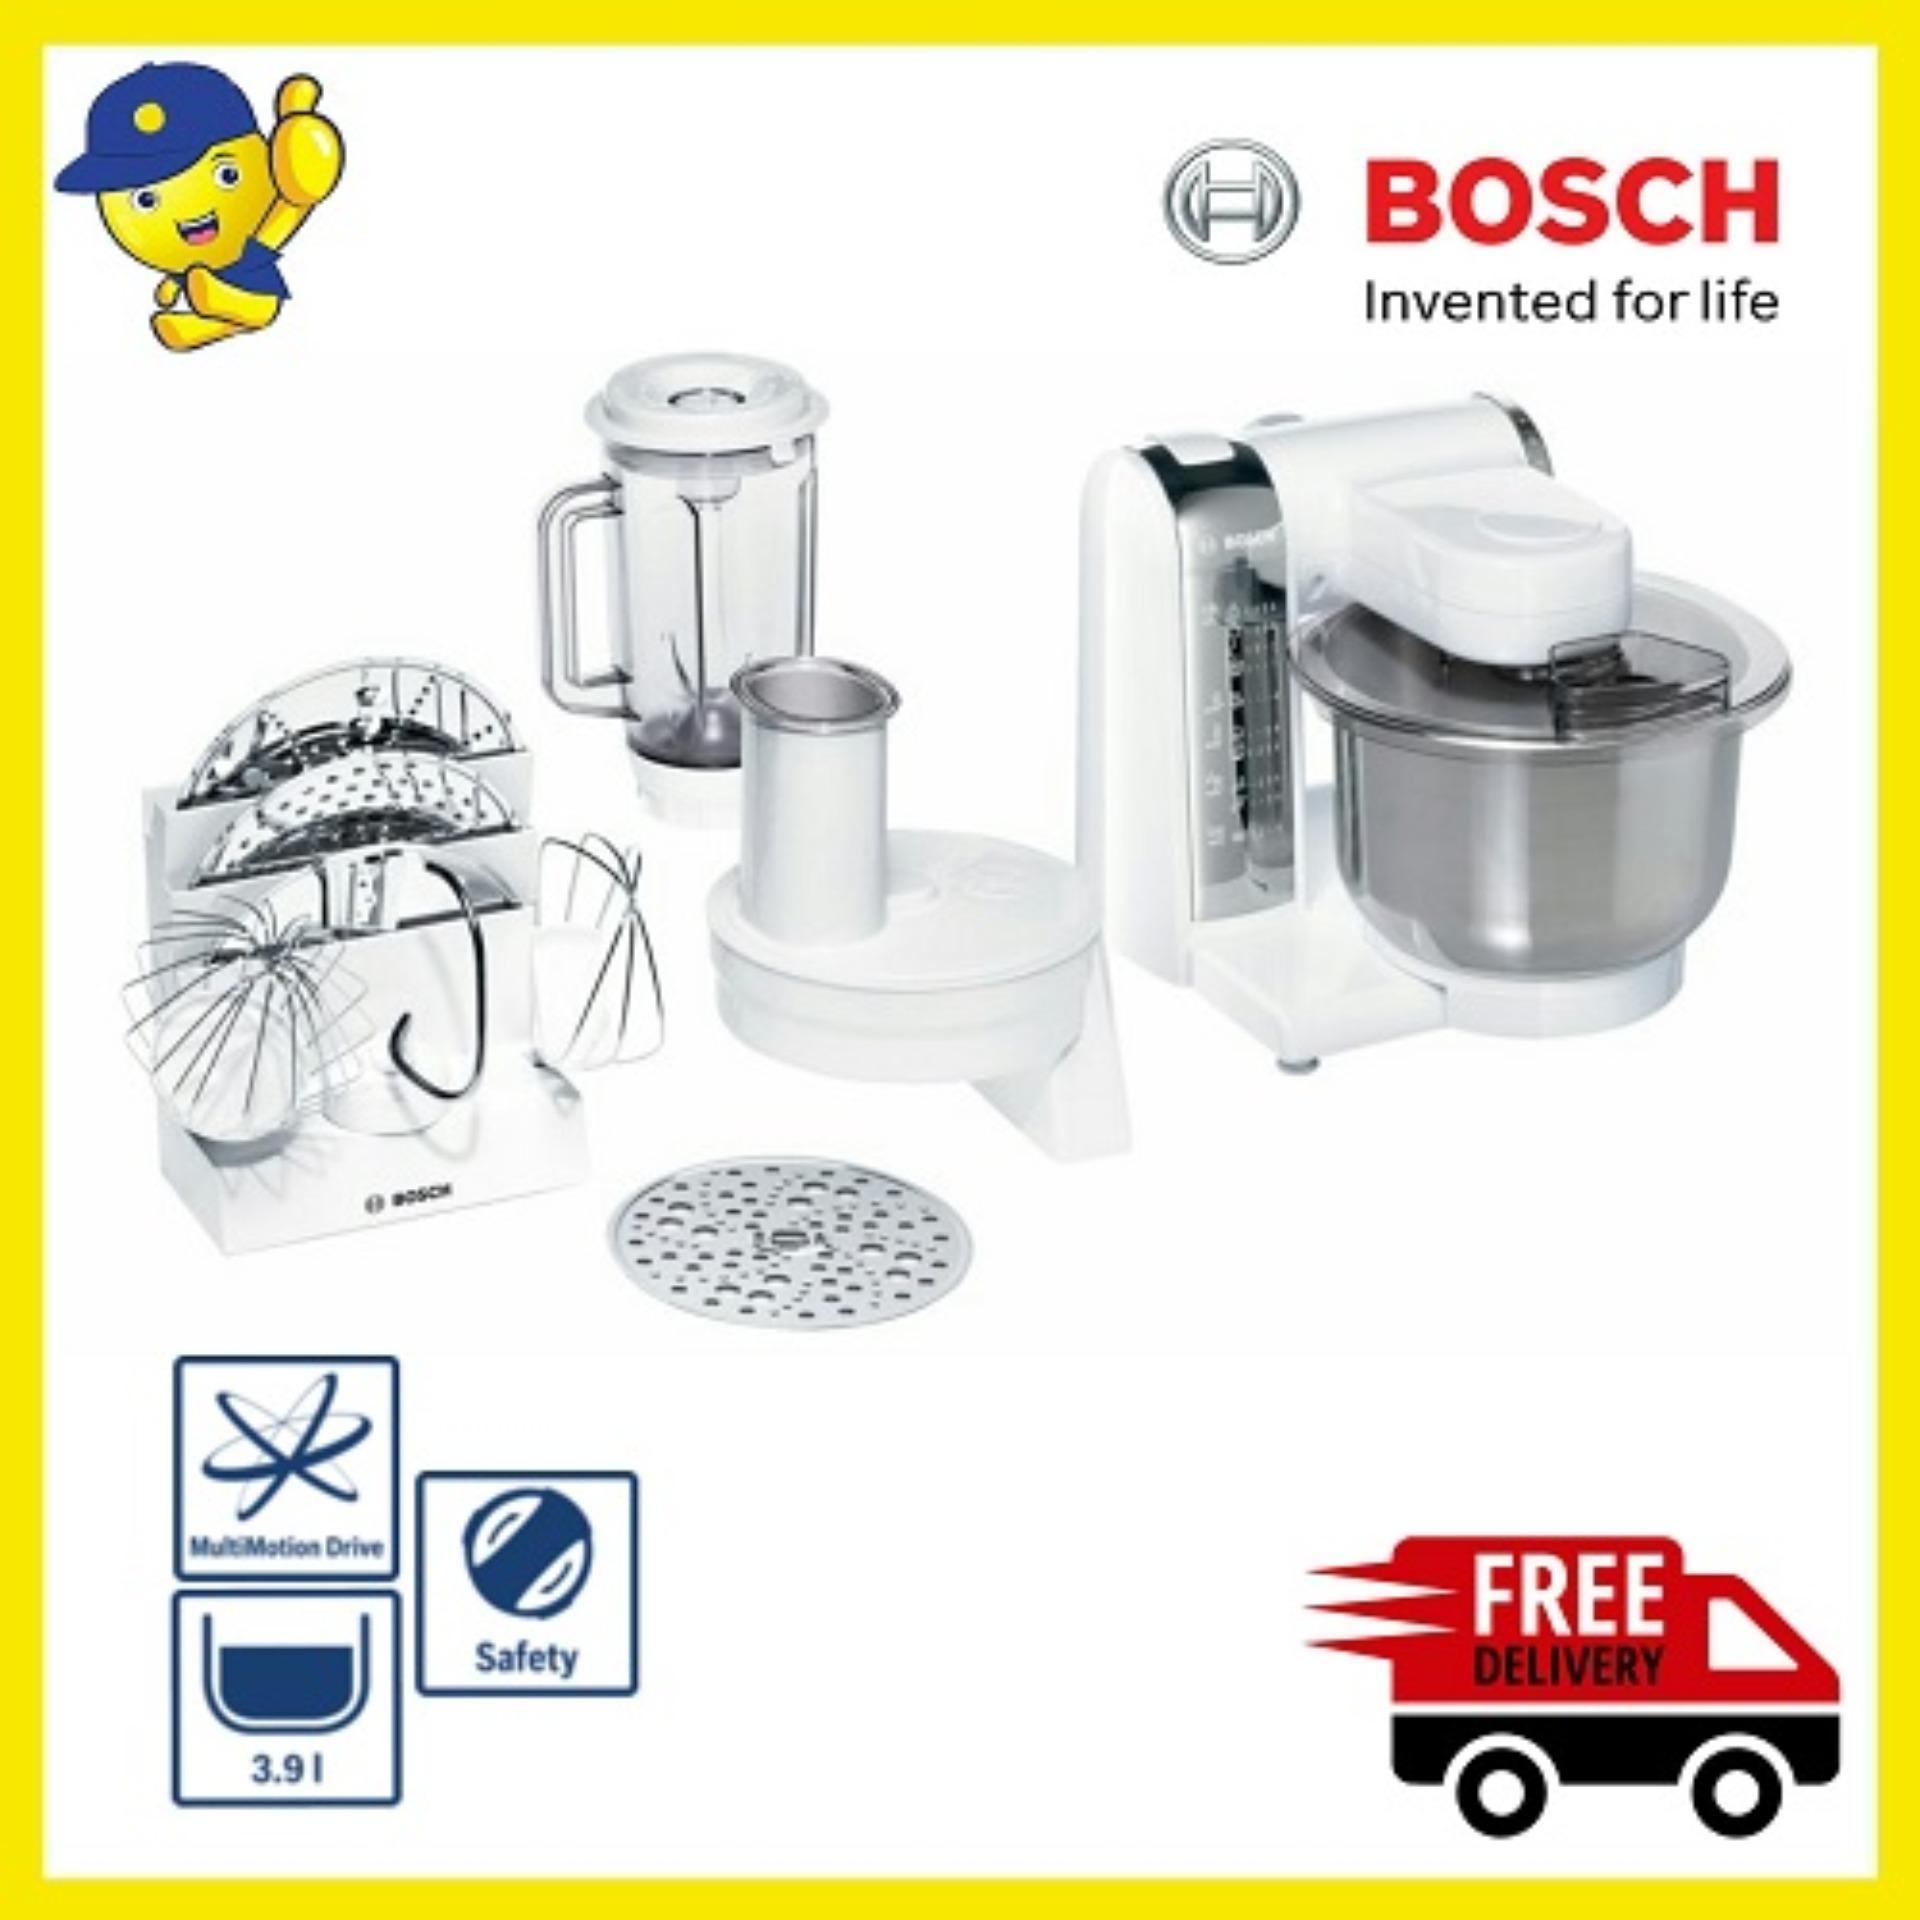 Bosch MUM48CR1 Kitchen Machine Mixer - Putih - Free Ongkir JABODETABEK